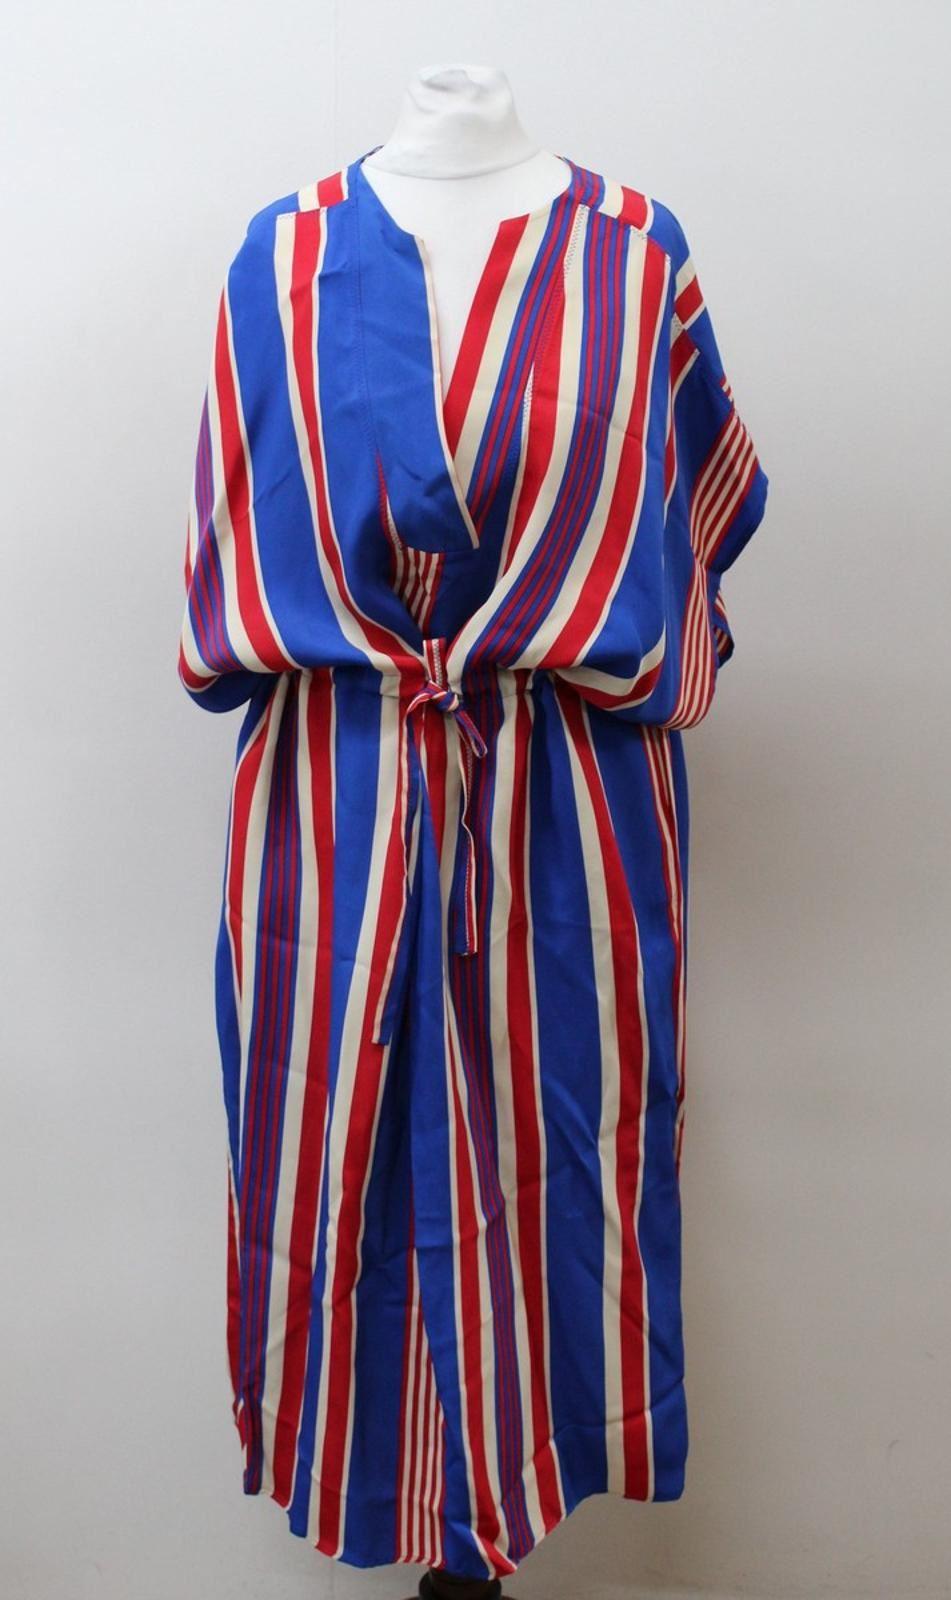 amp-Other-Stories-Bleu-Femmes-Rouge-Col-V-manches-courtes-a-rayures-robe-EU36-UK10